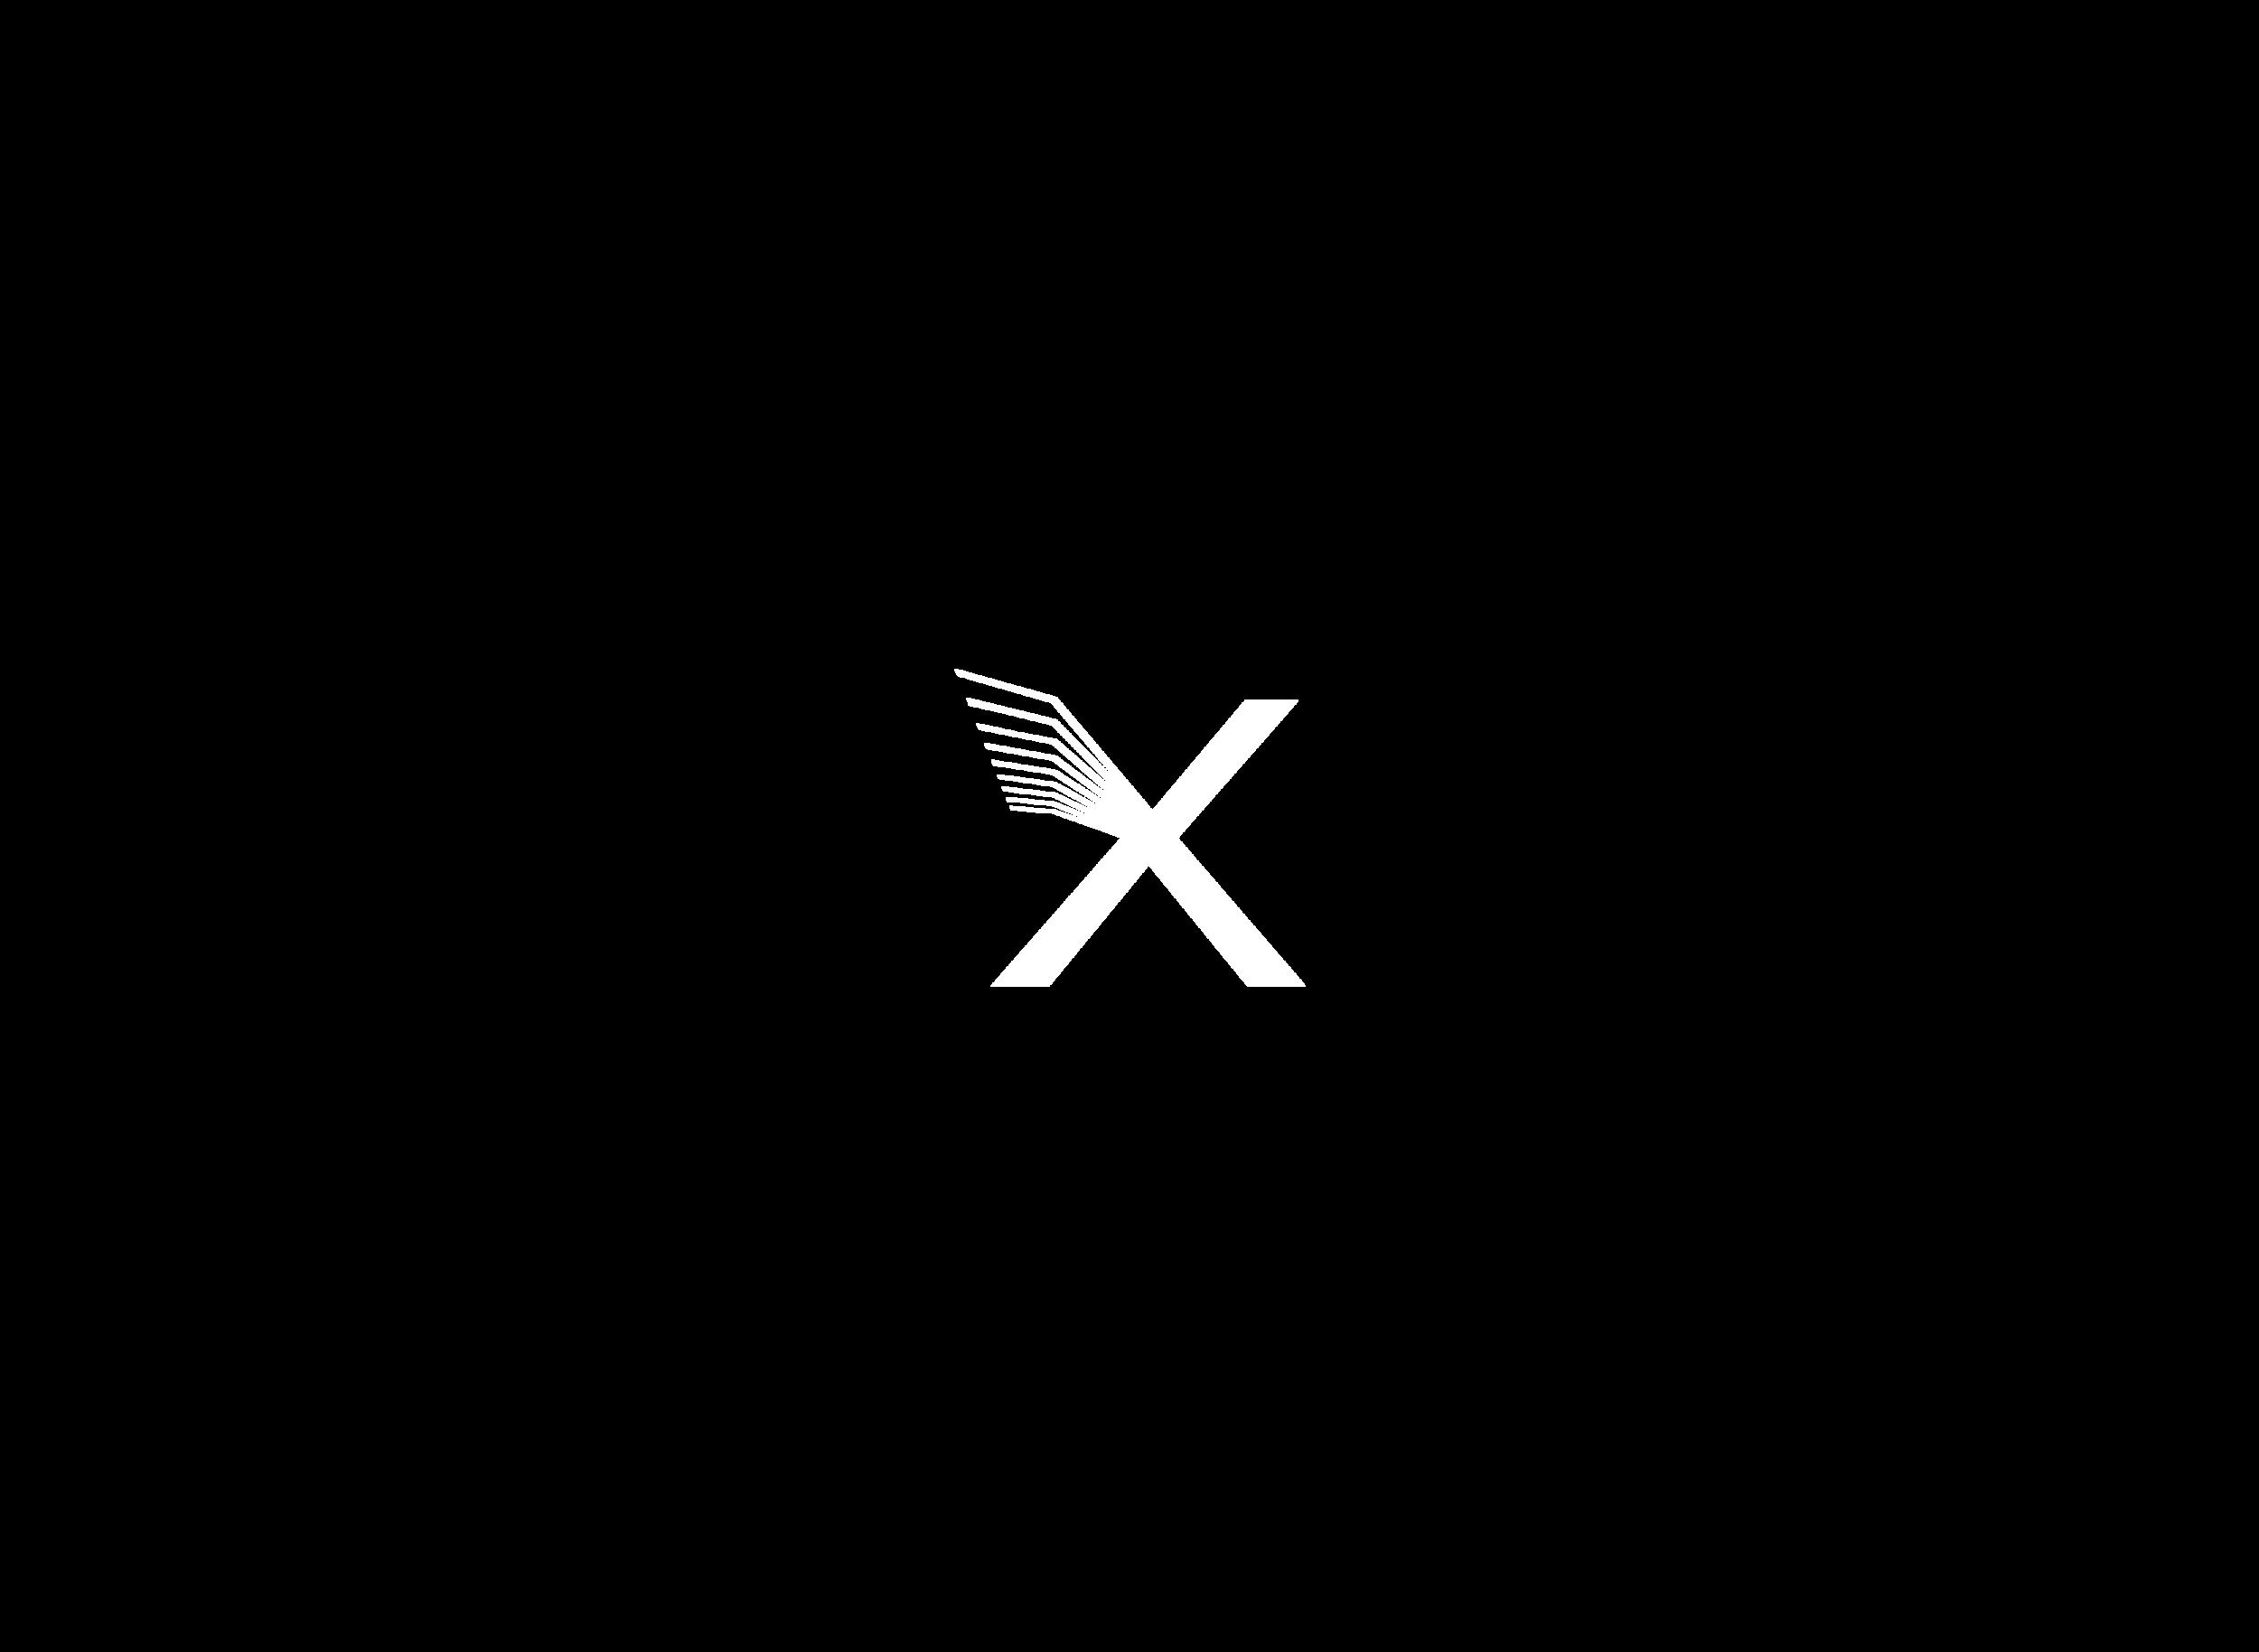 XLogo_white_banner_blank.png